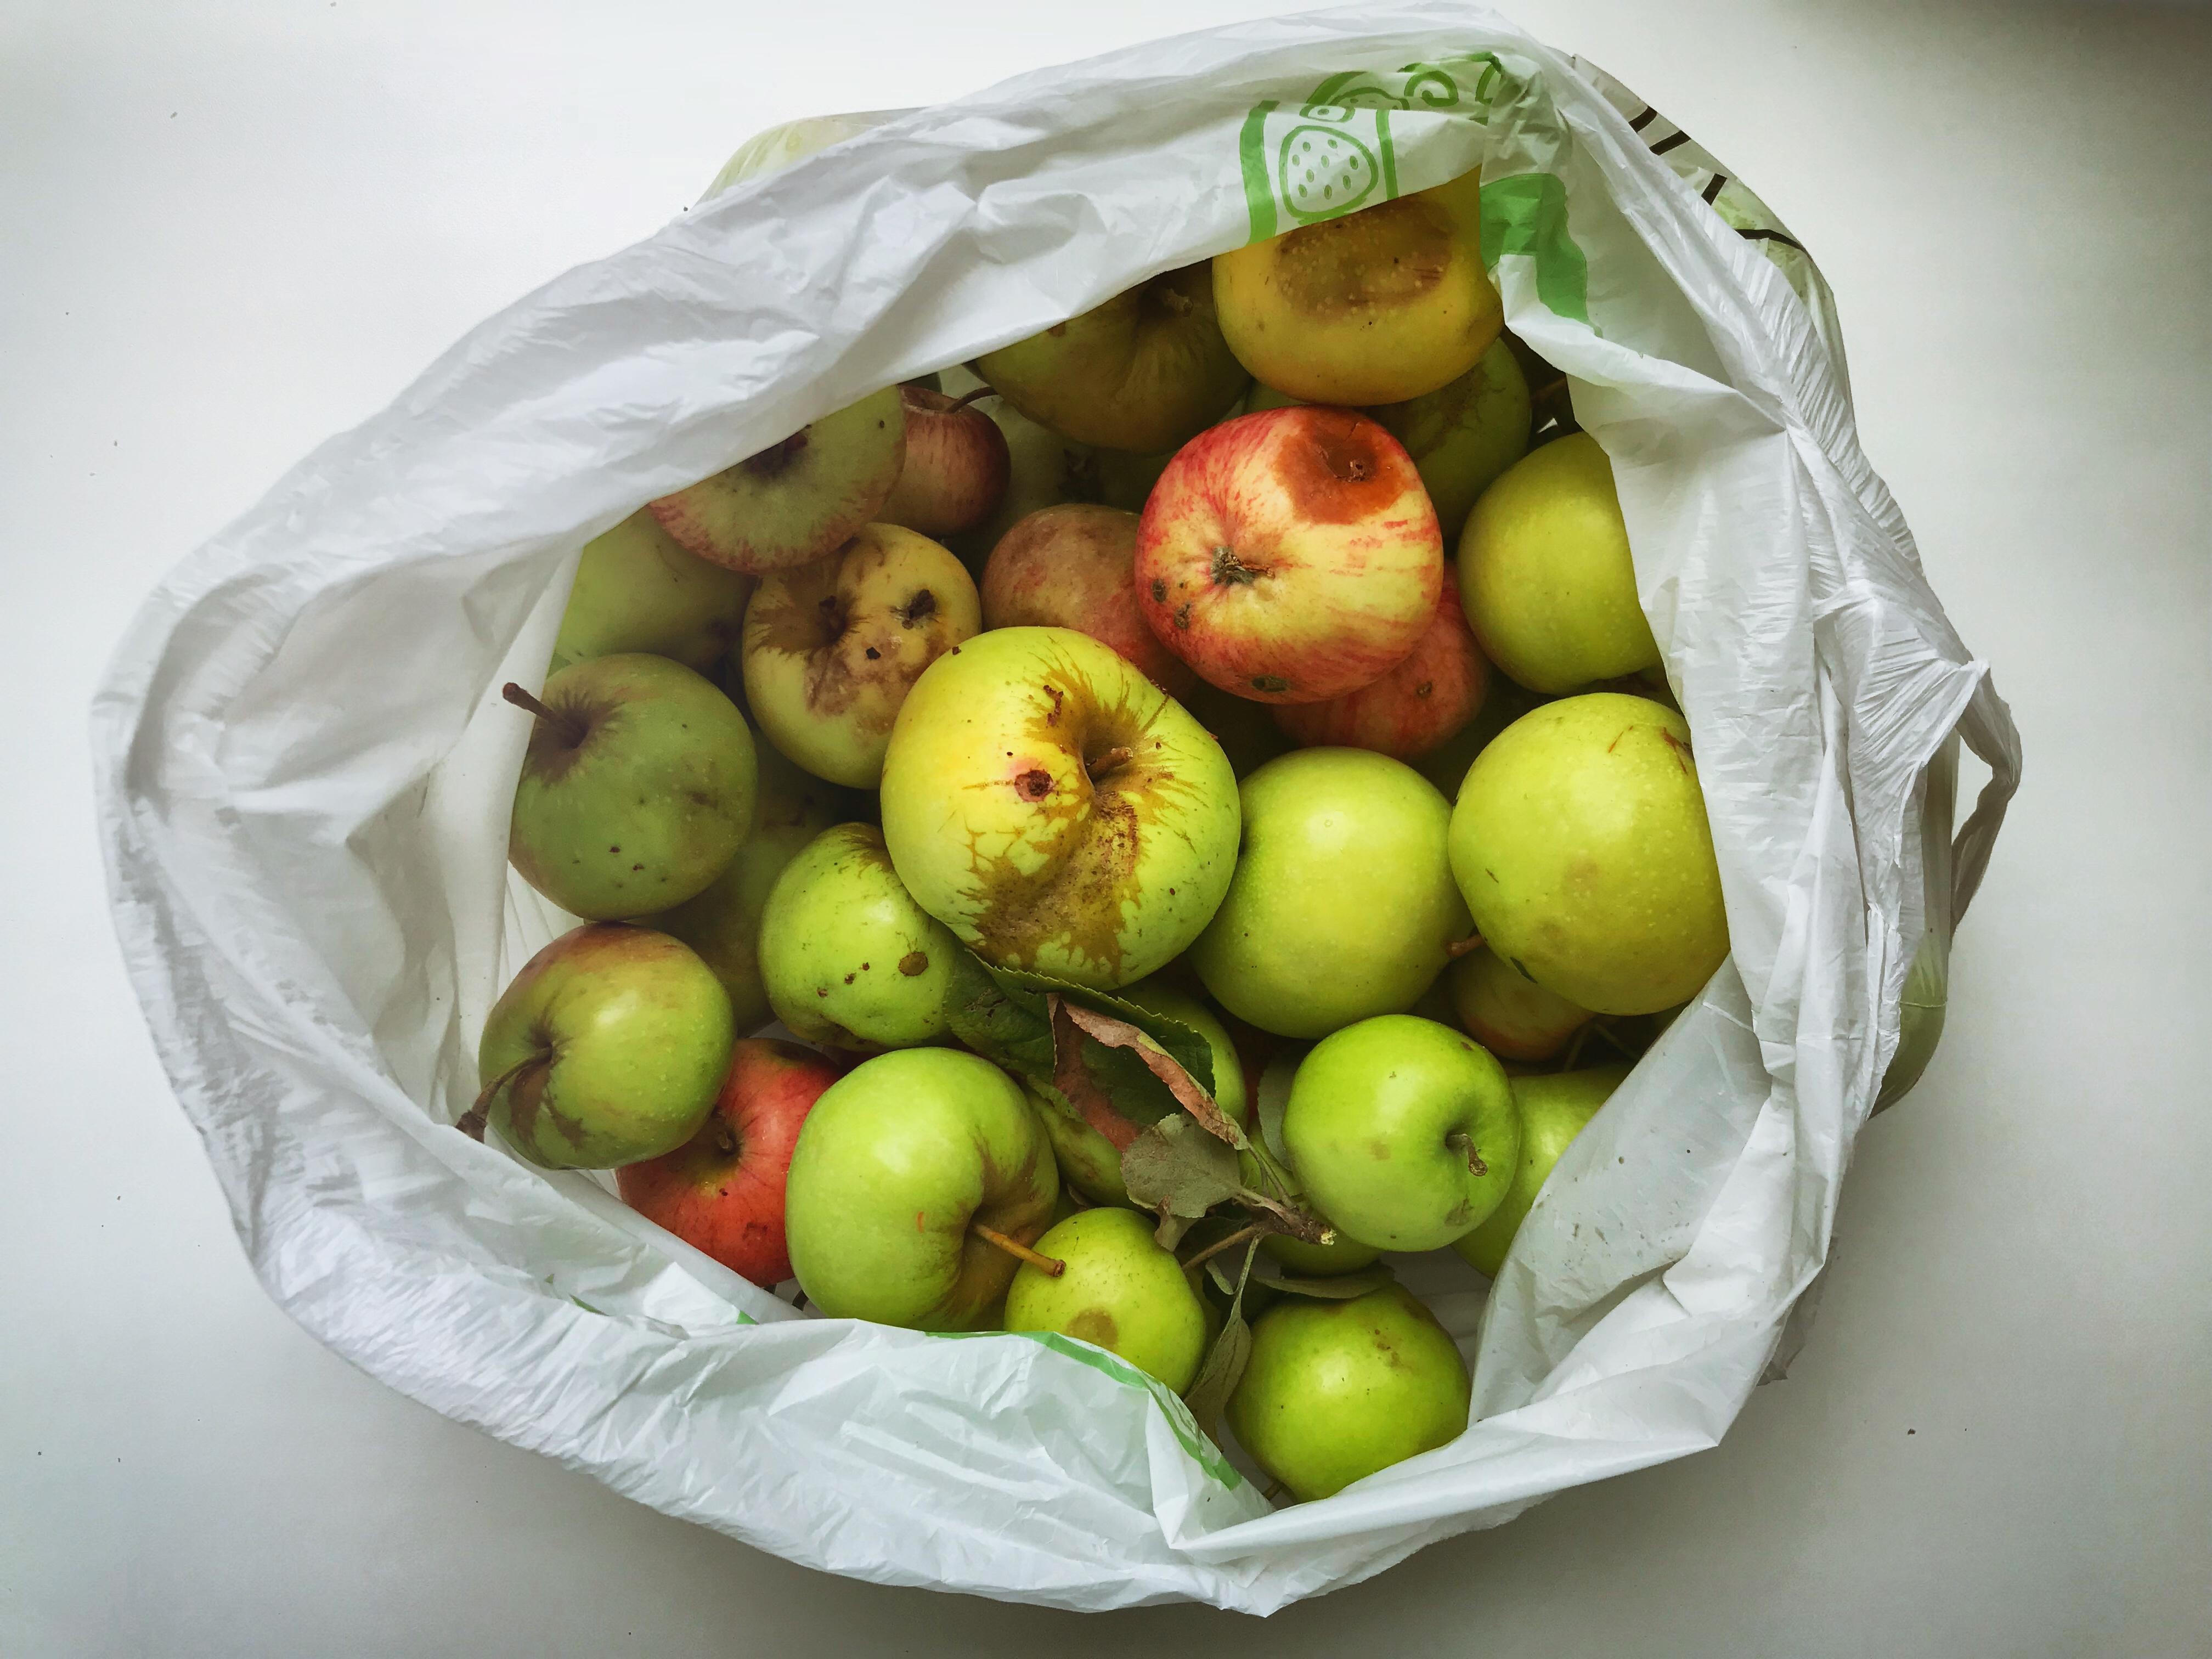 kolomenskoje aepfel plastiktuete kscheib